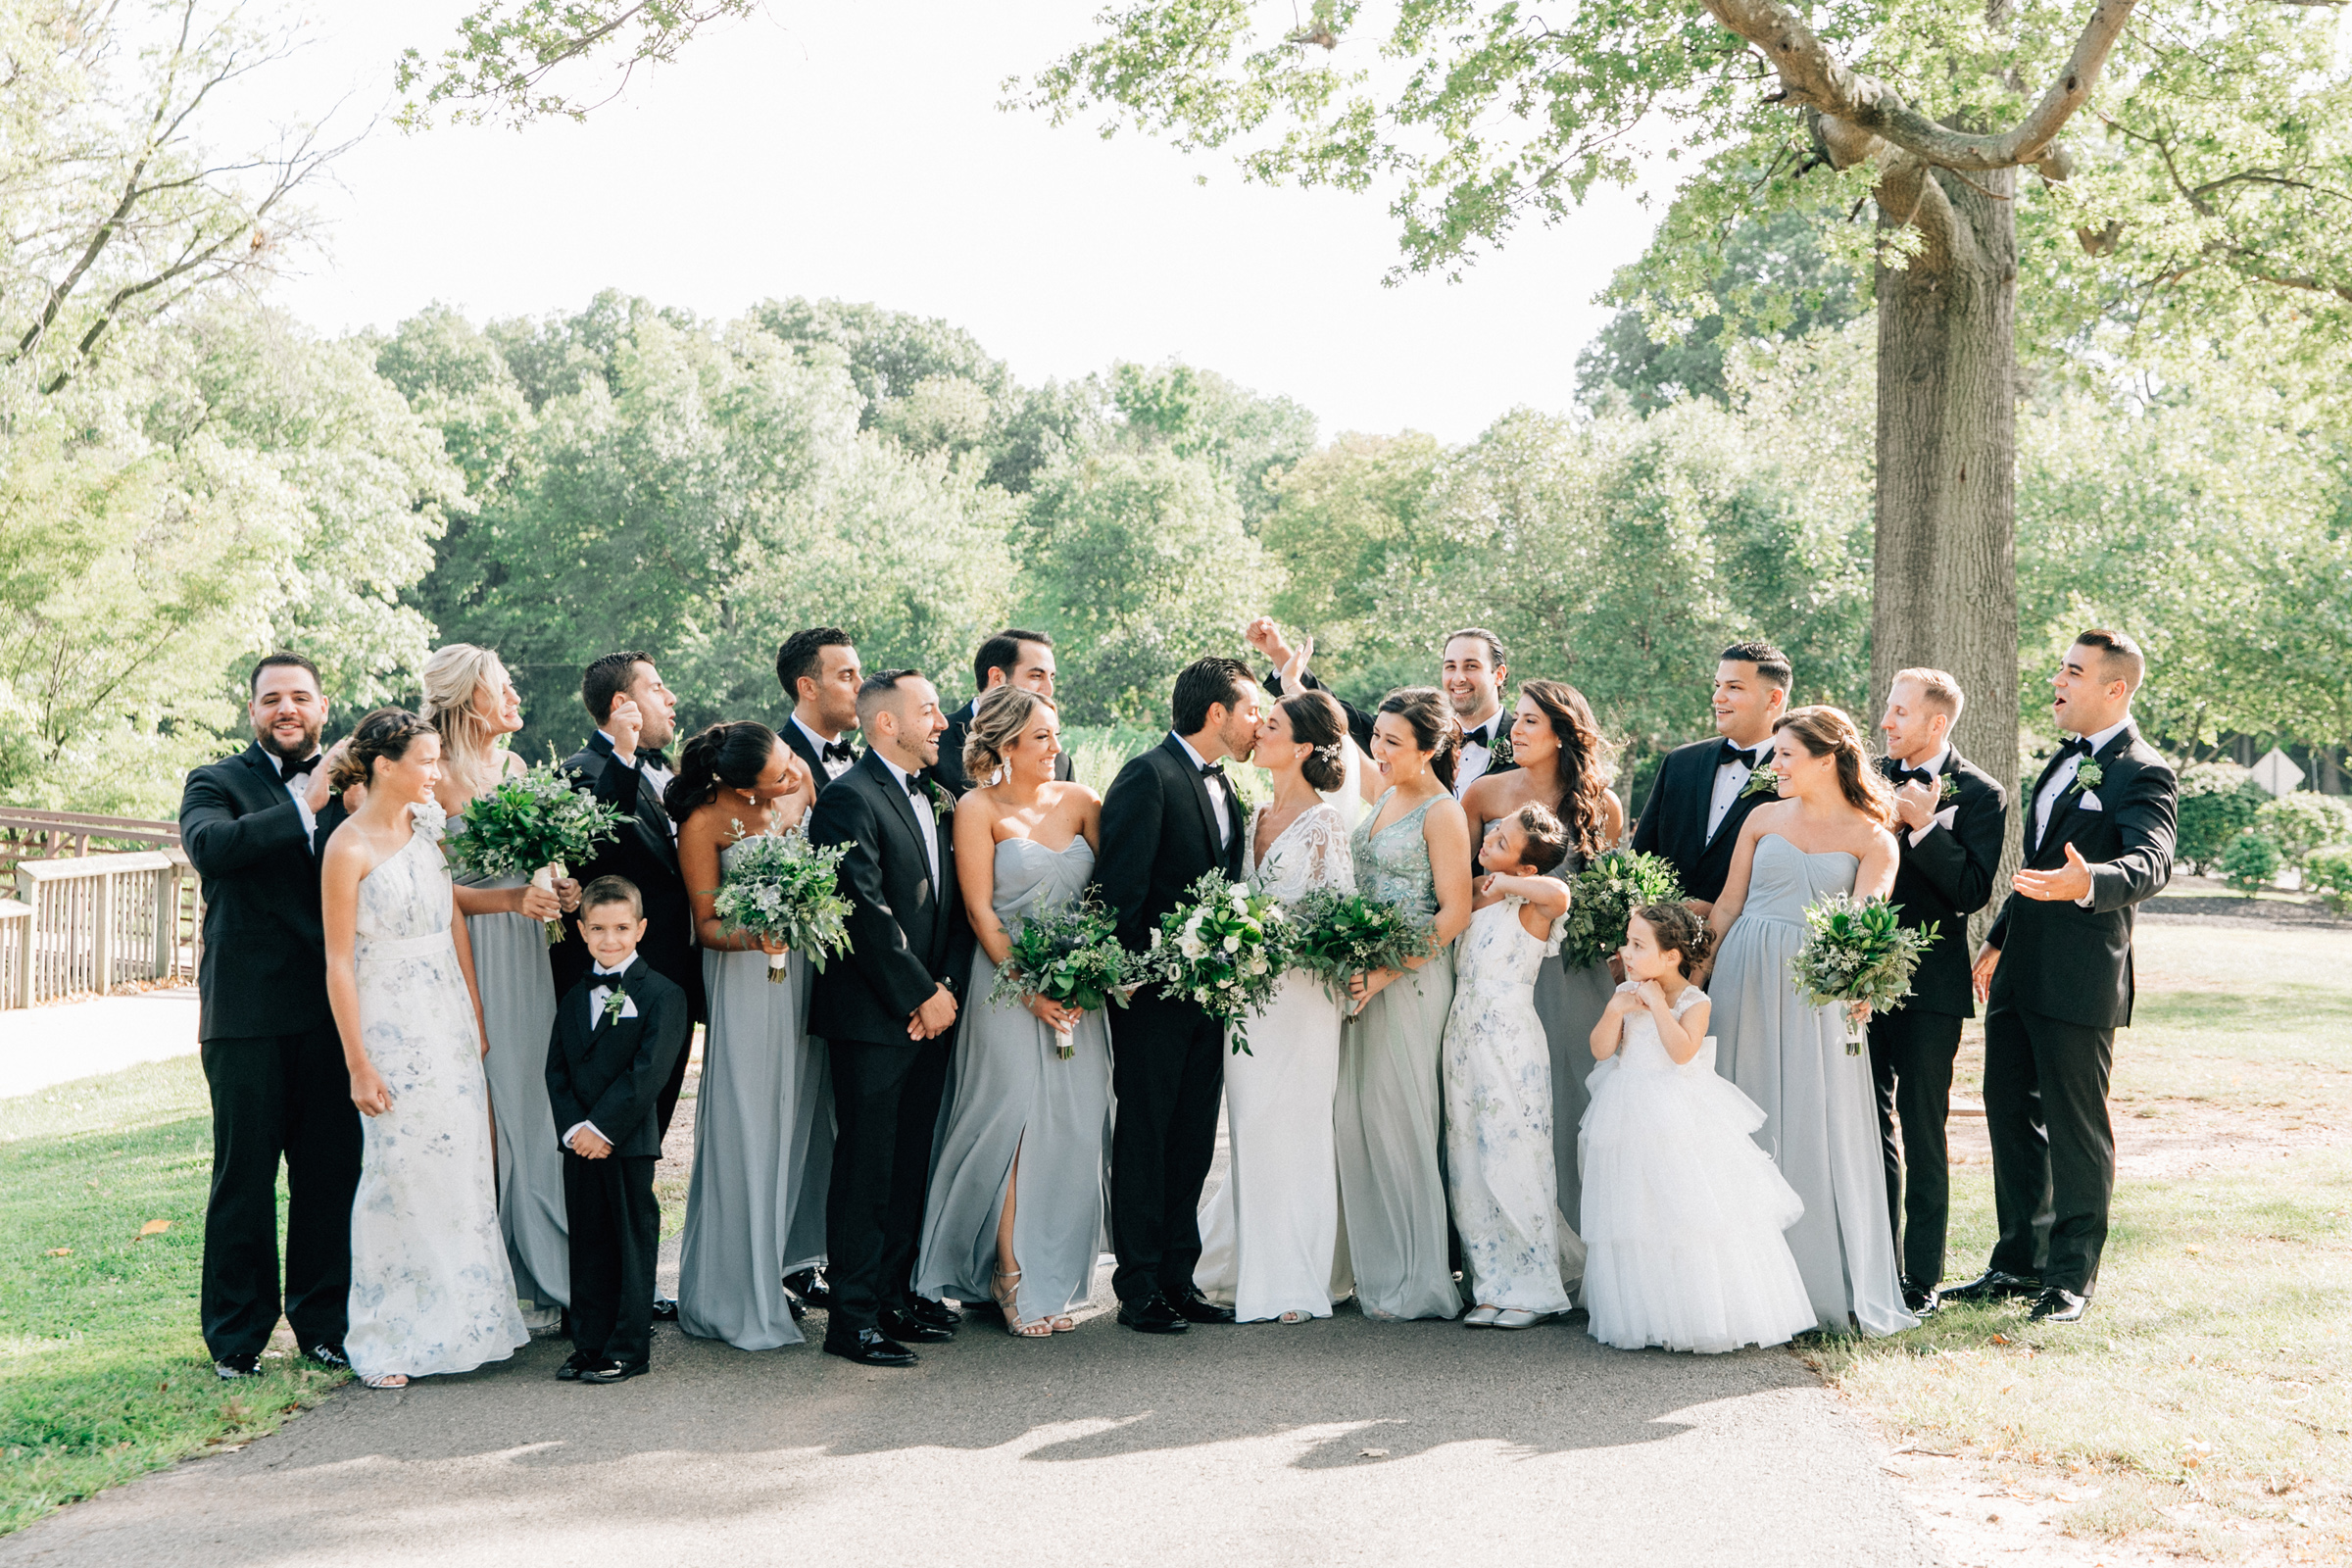 Elegant New Jersey Wedding with Greenery 6